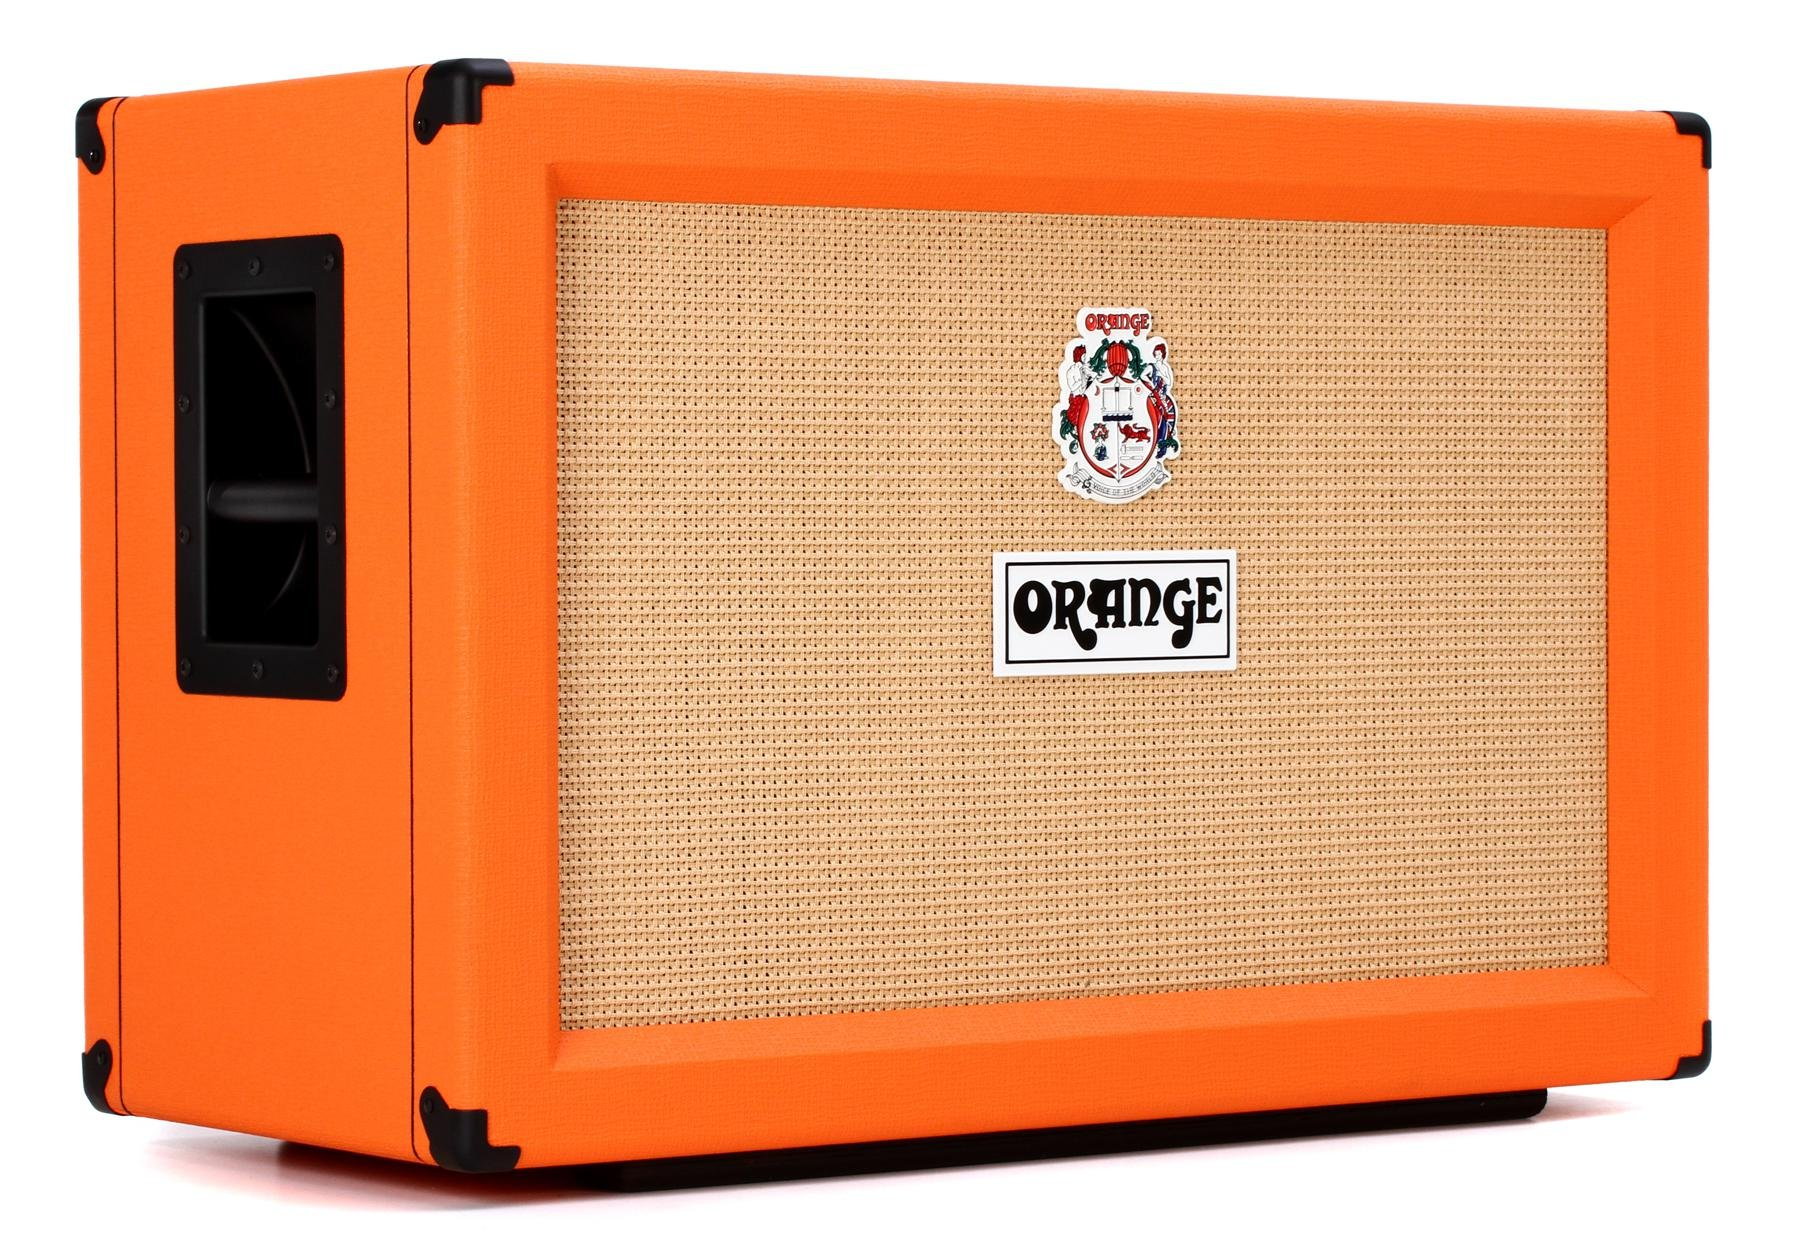 hight resolution of orange ppc212 120 watt 2x12 cabinet orange image 1